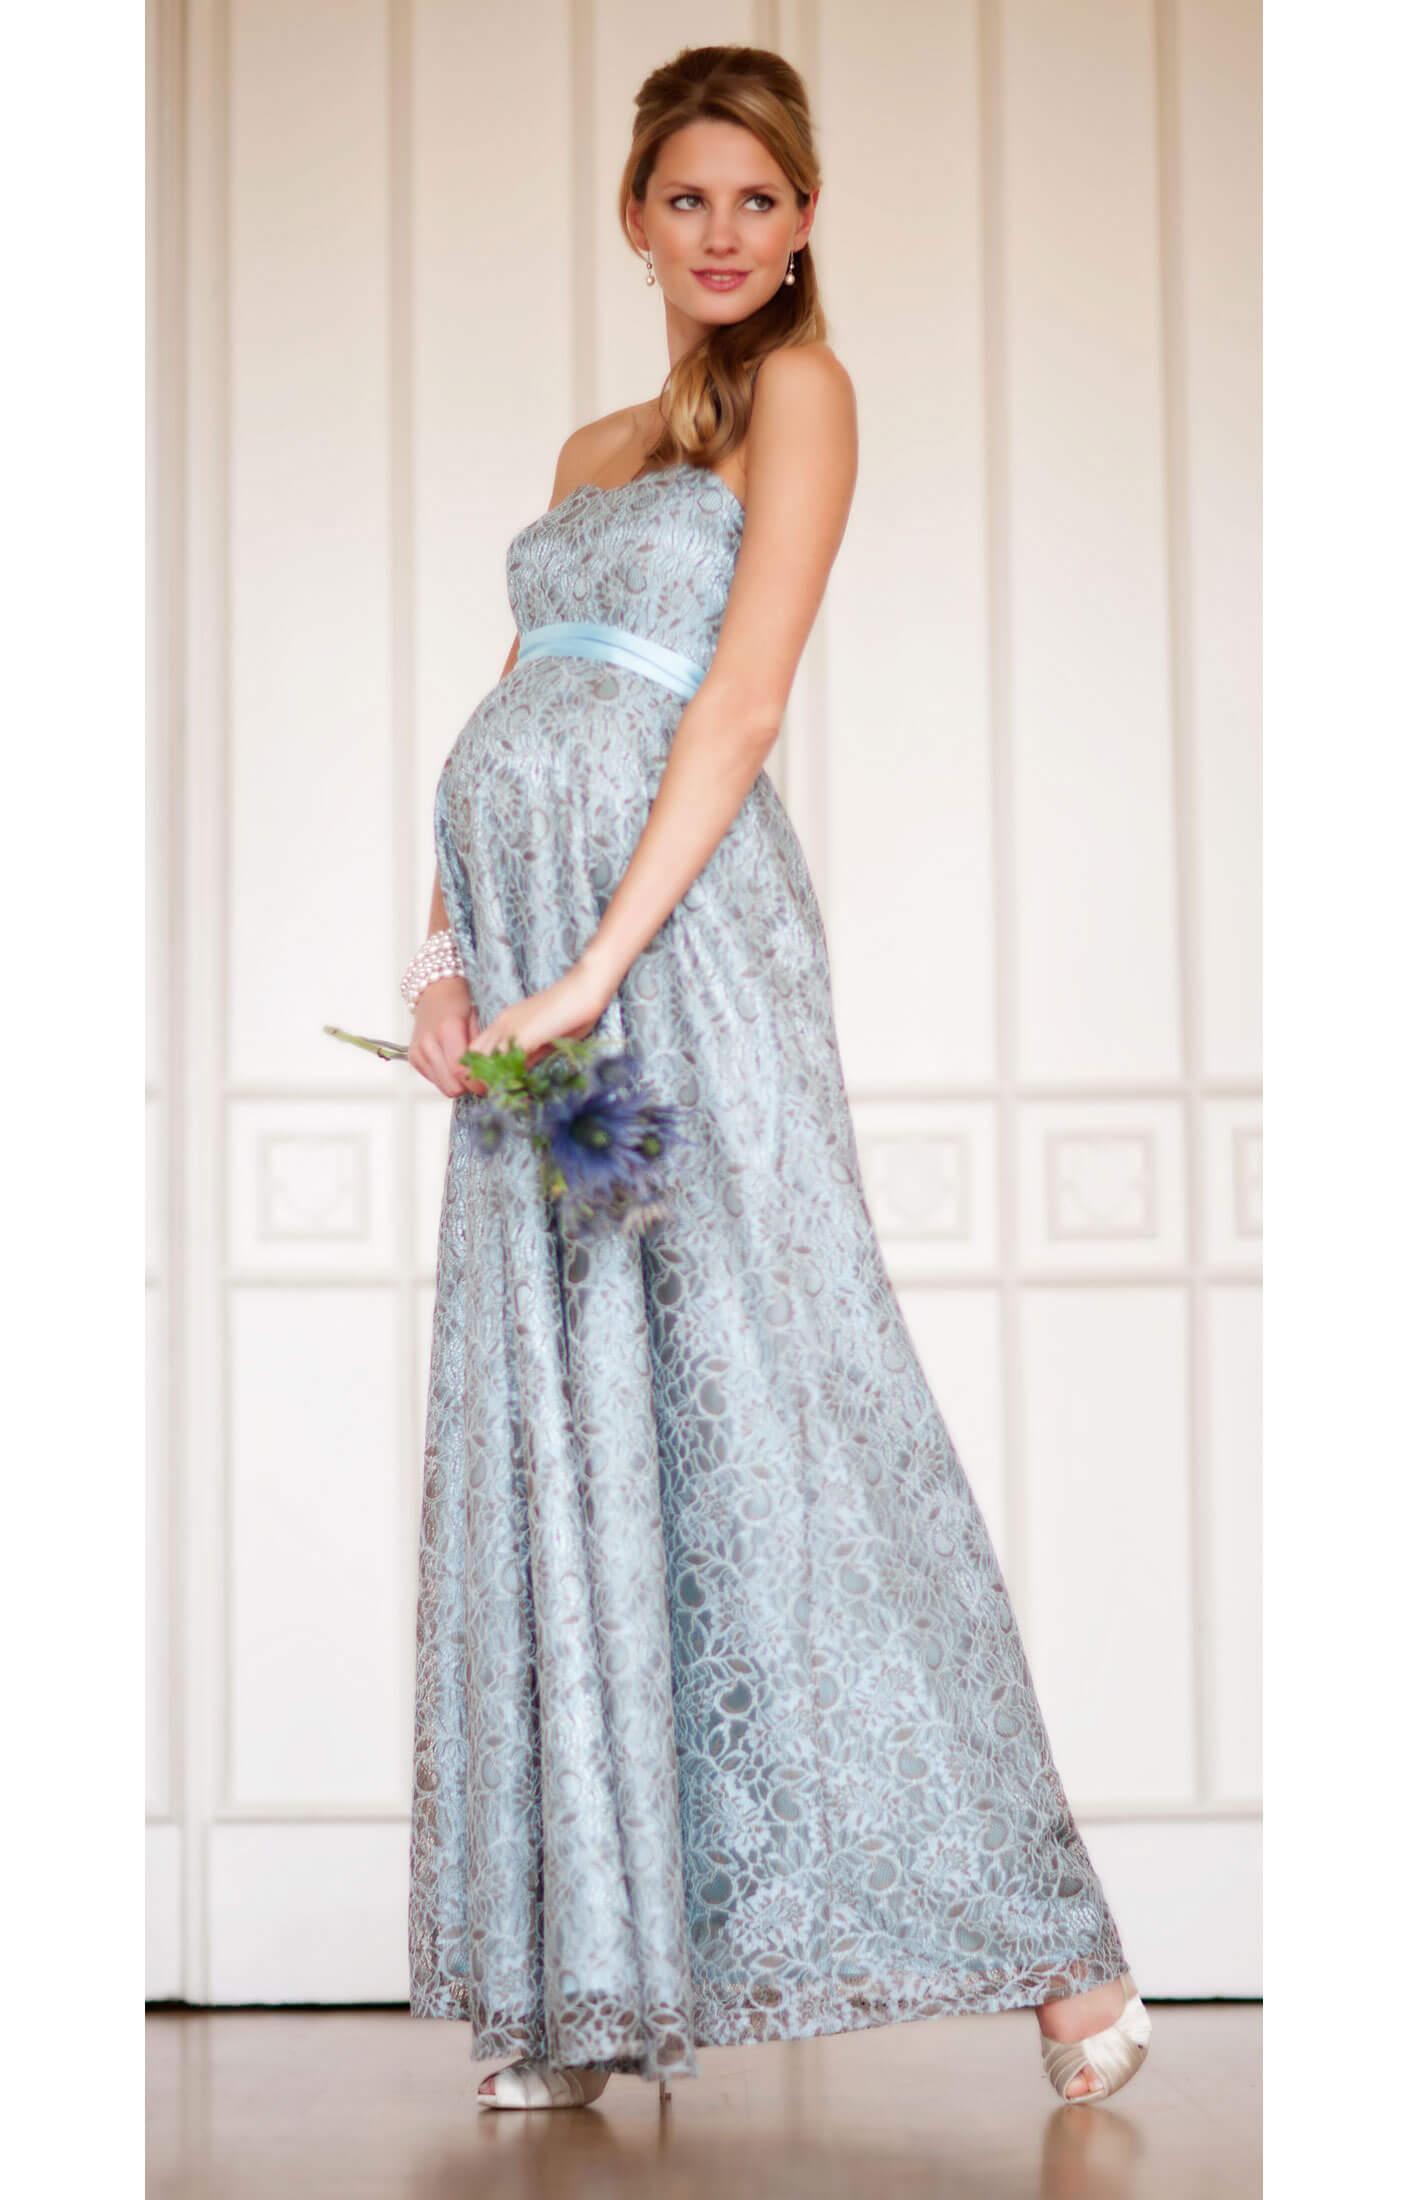 Savona Maternity Gown (Blue) - Maternity Wedding Dresses, Evening ...